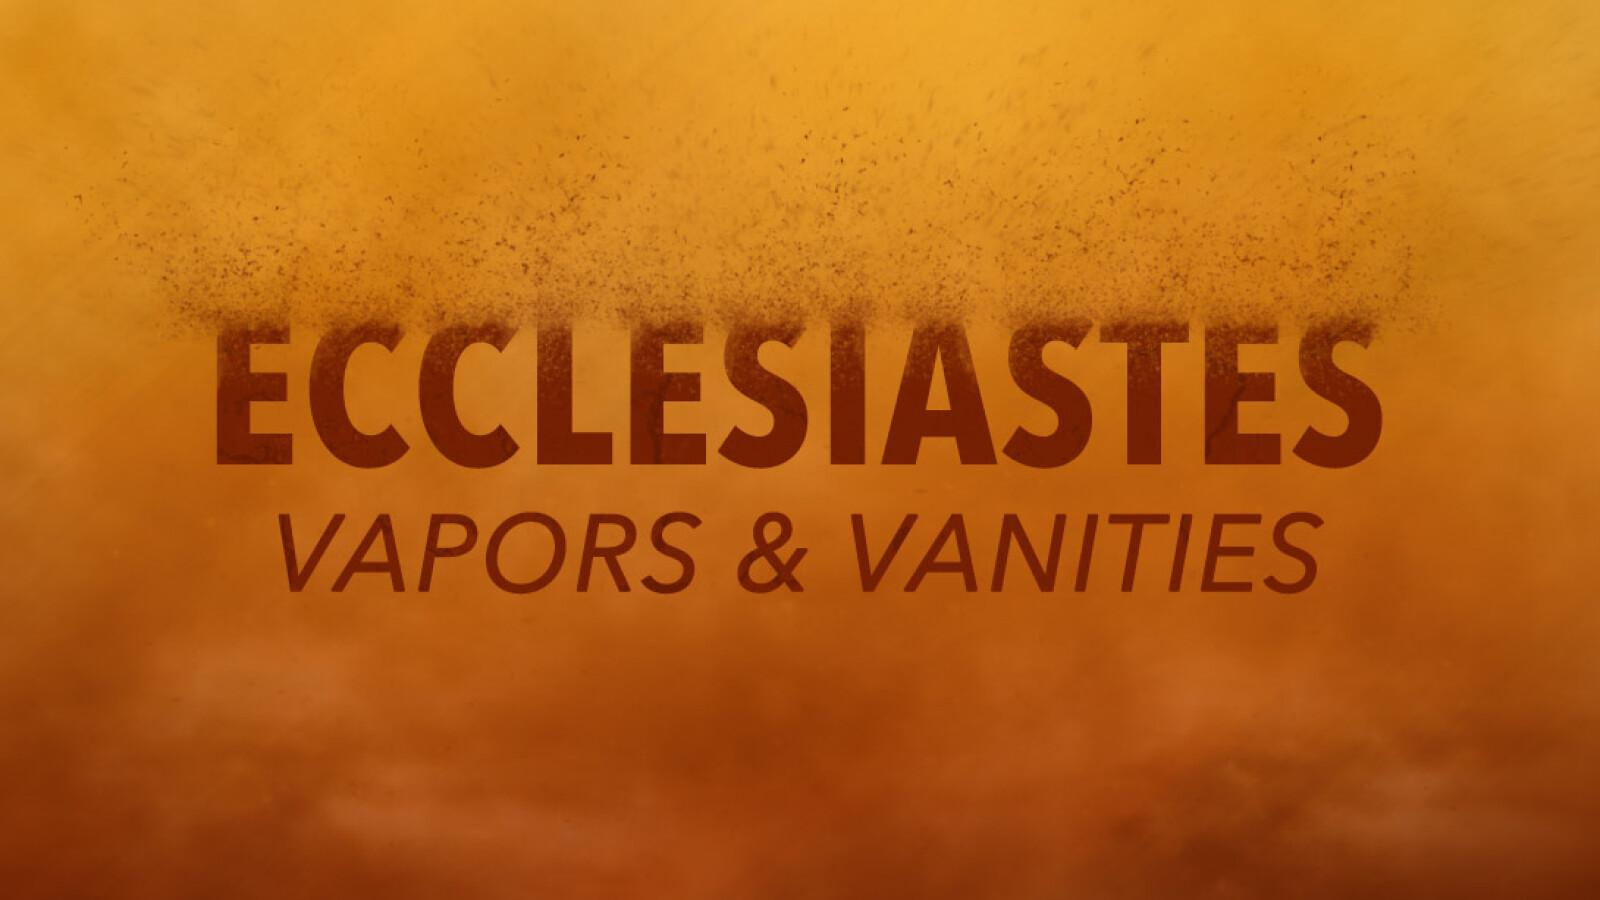 Ecclesiastes: Vapors & Vanities